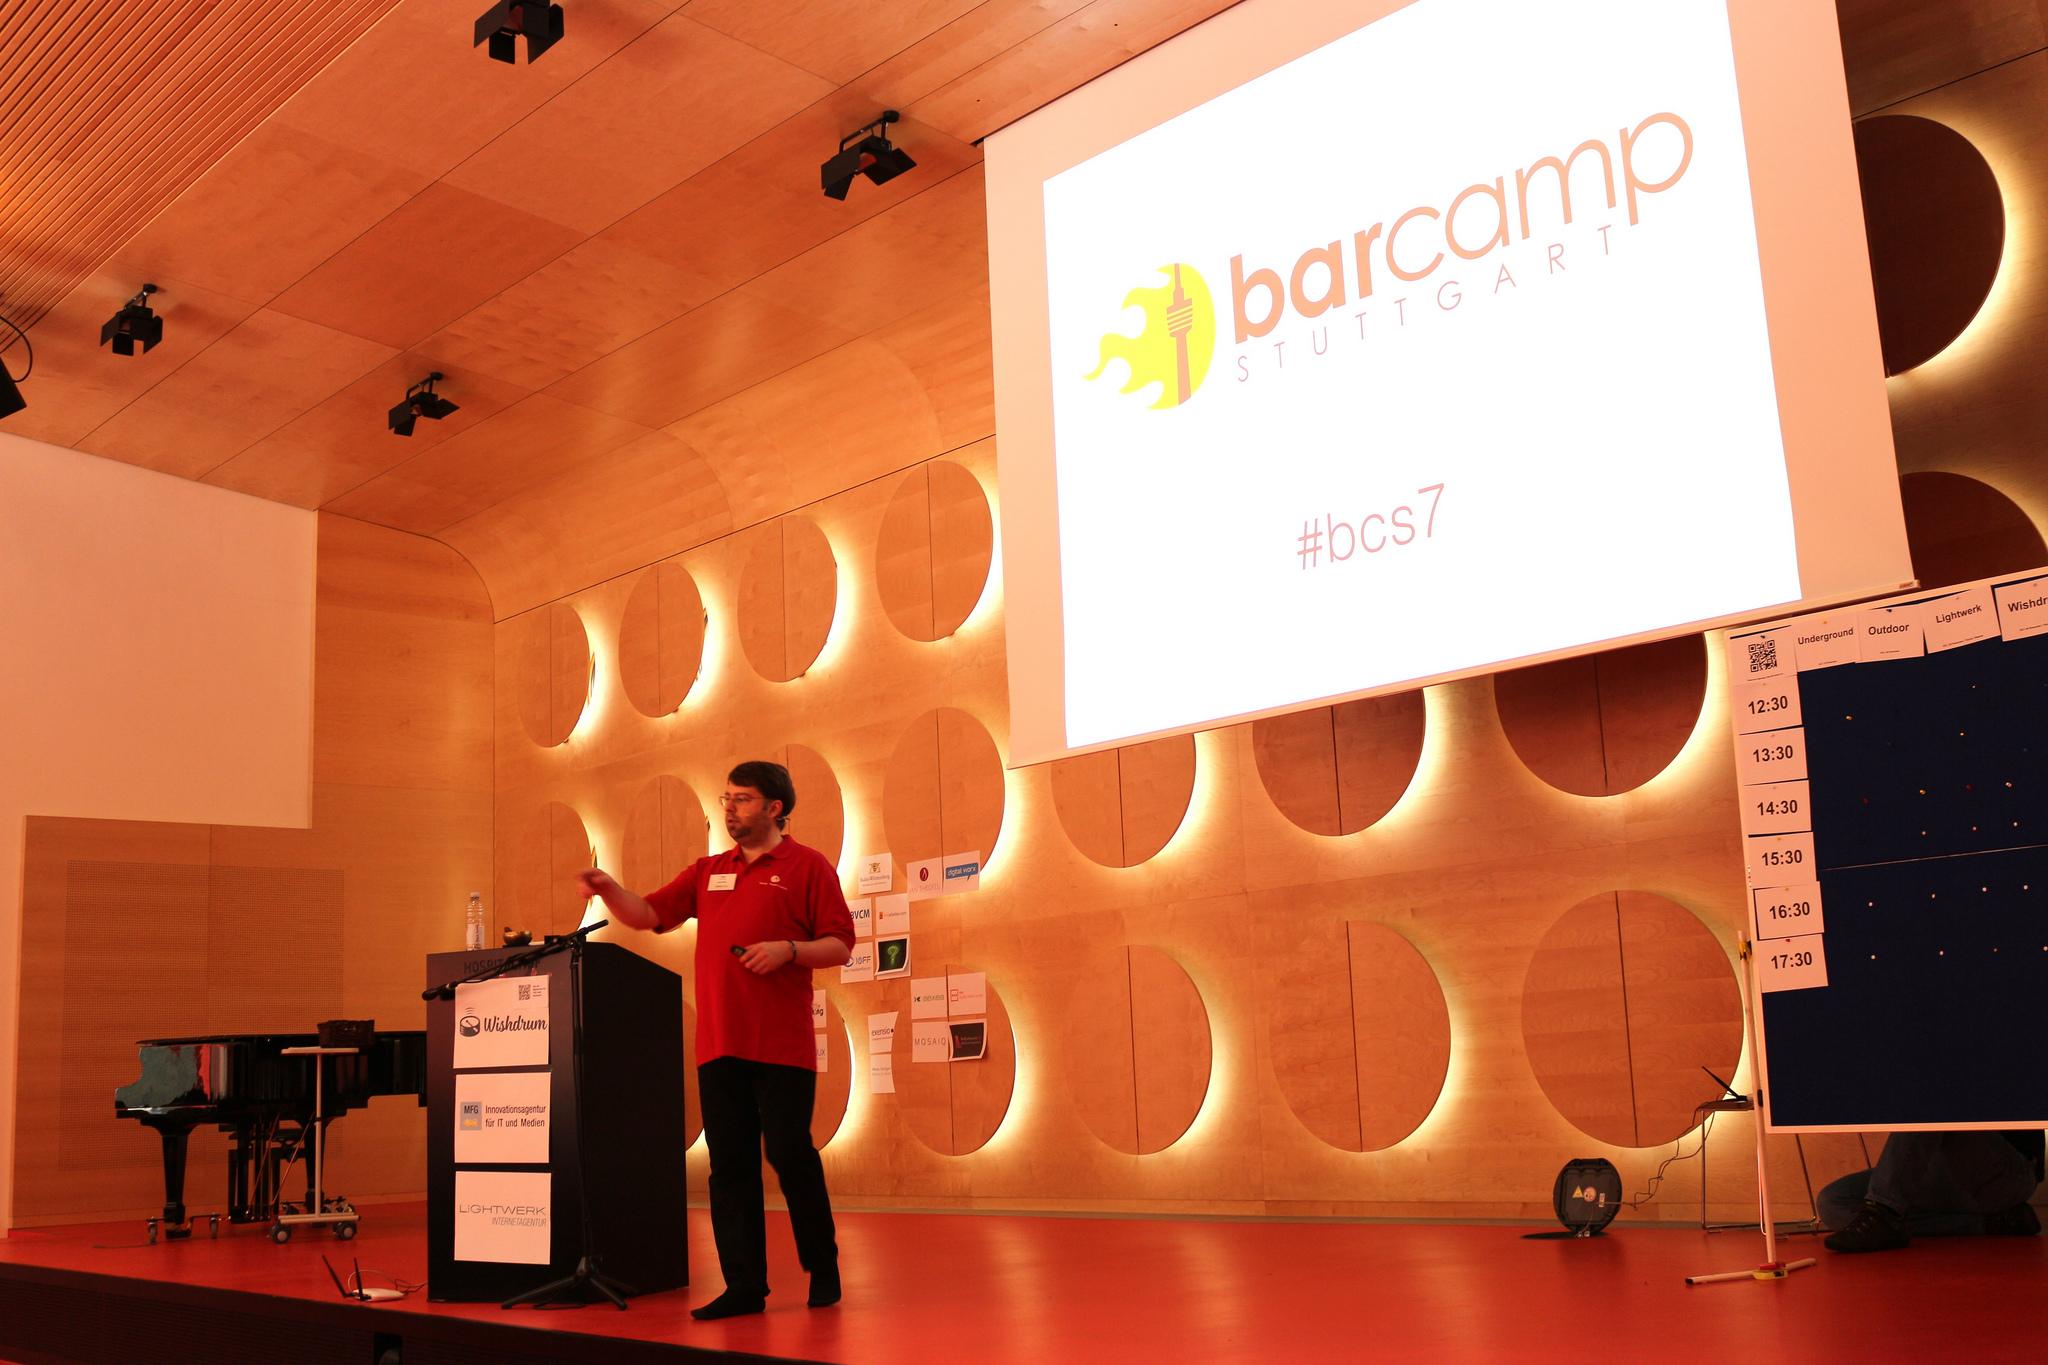 Jan Theofel aka Mr. Barcamp